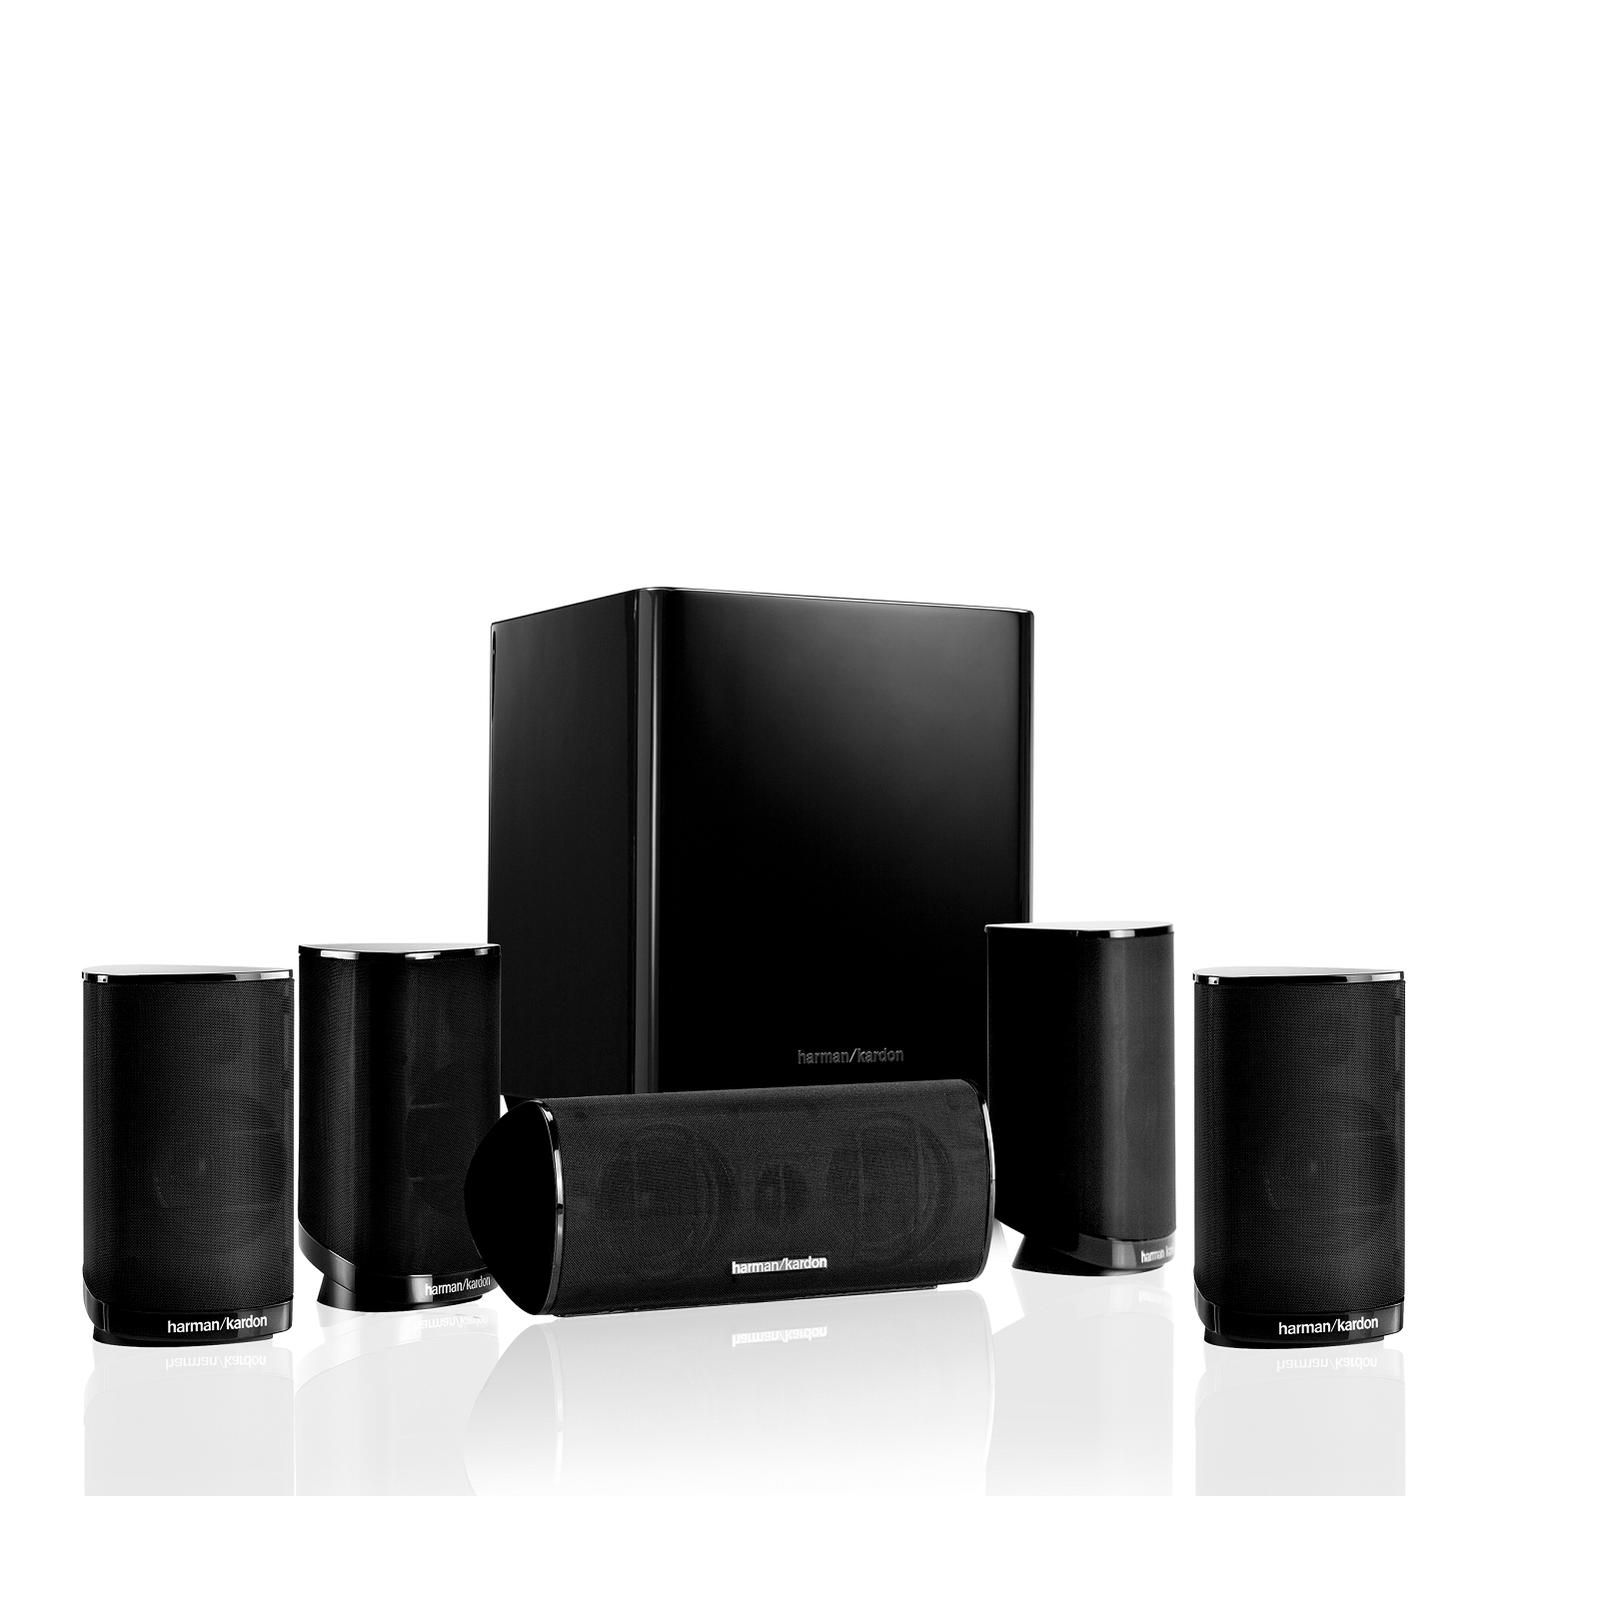 Harman Kardon HKTS 9 5.1-Channel Home Theater Speaker System $155 Shipped